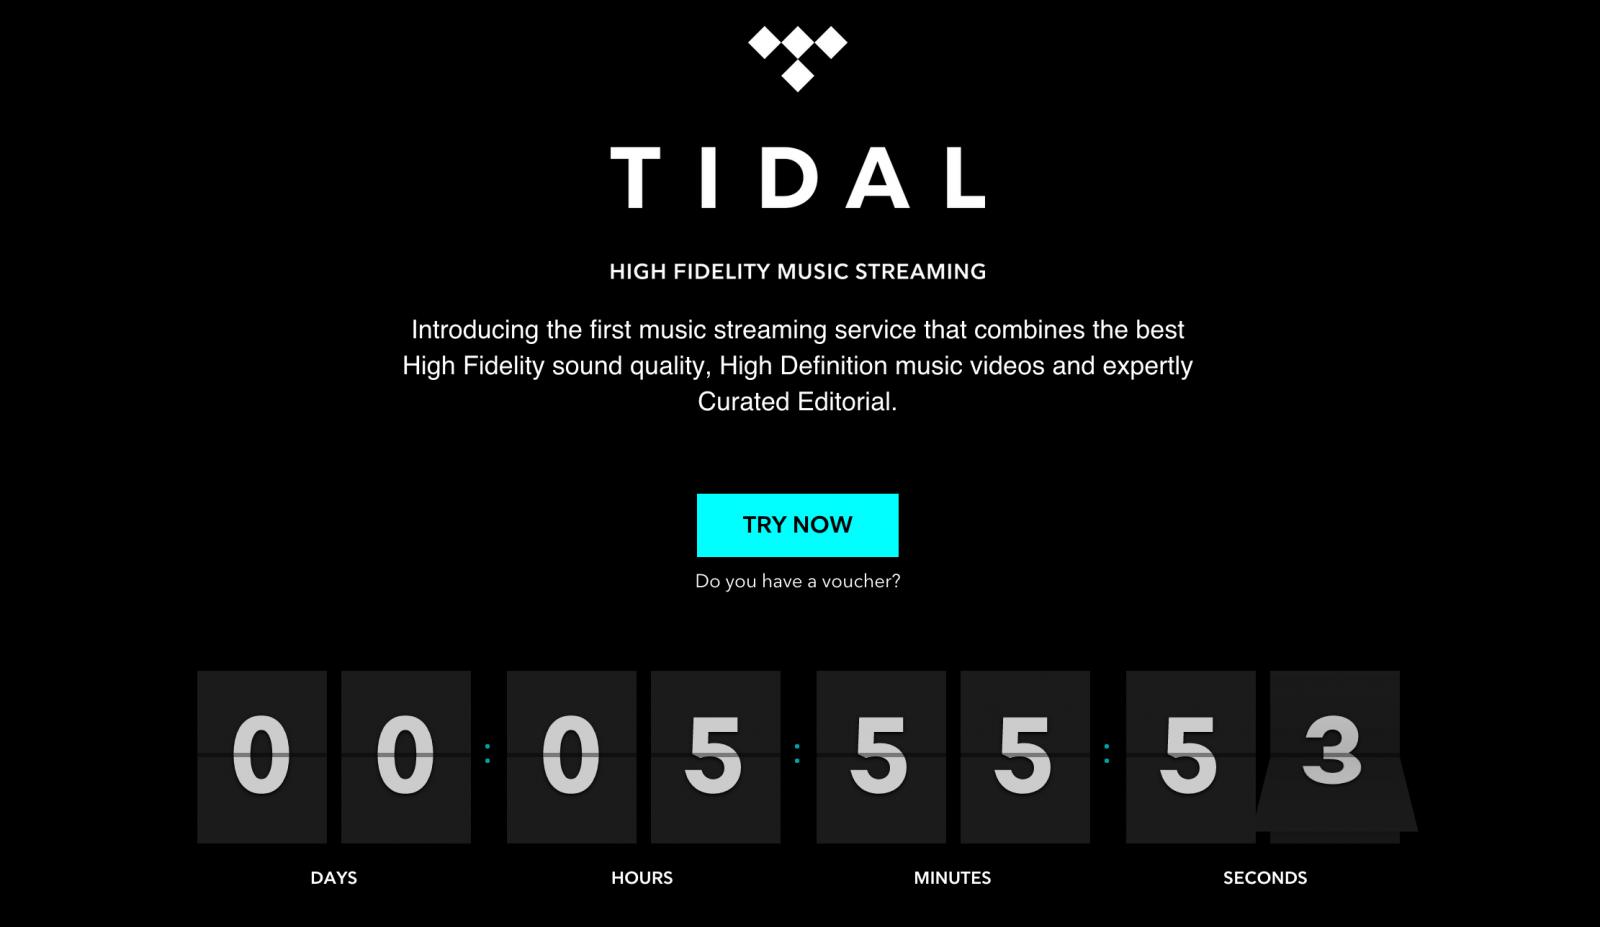 Tidal music streaming livestream